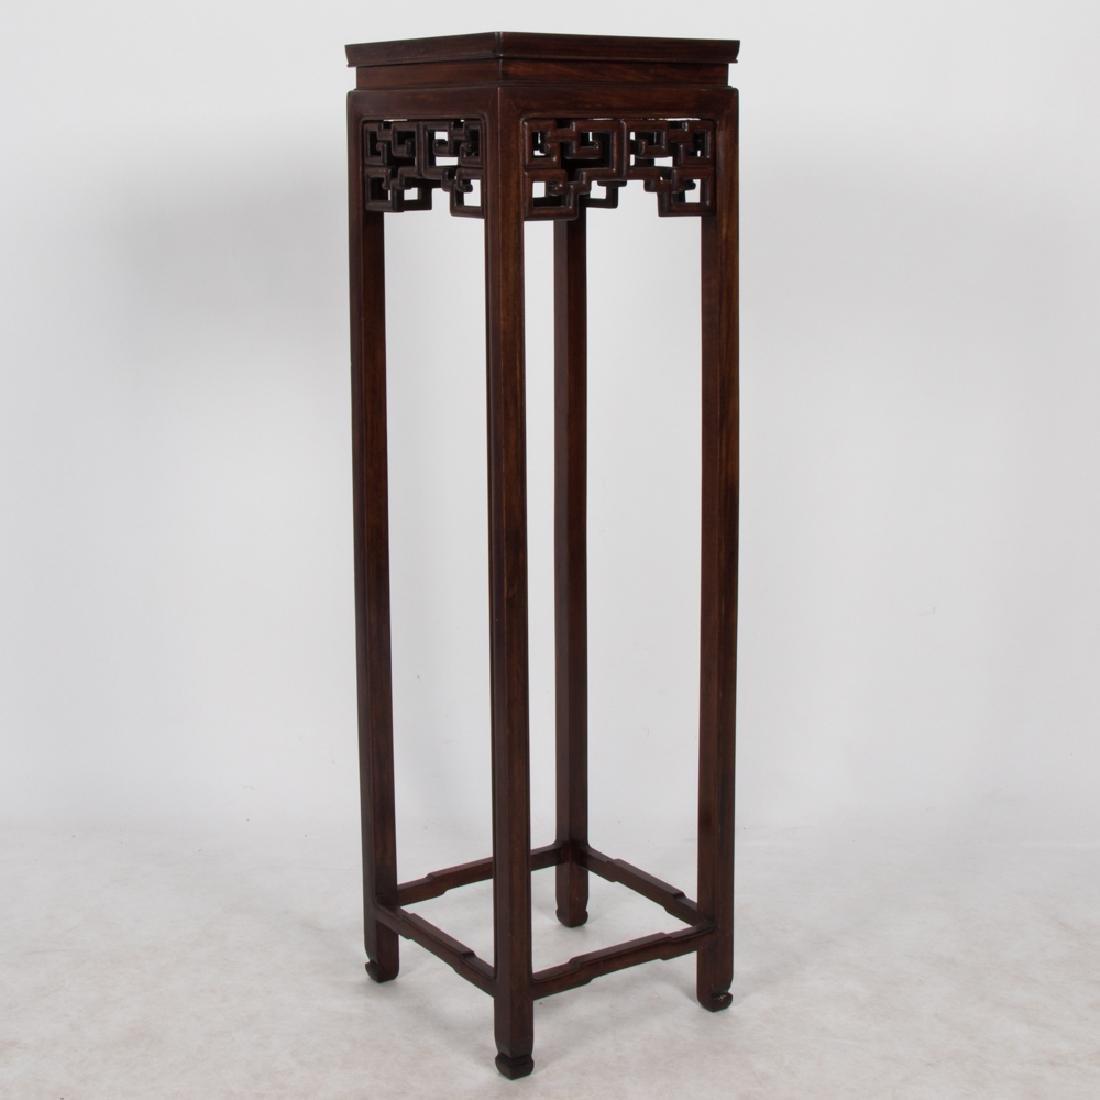 A Chinese Elm Pedestal, 20th Century.